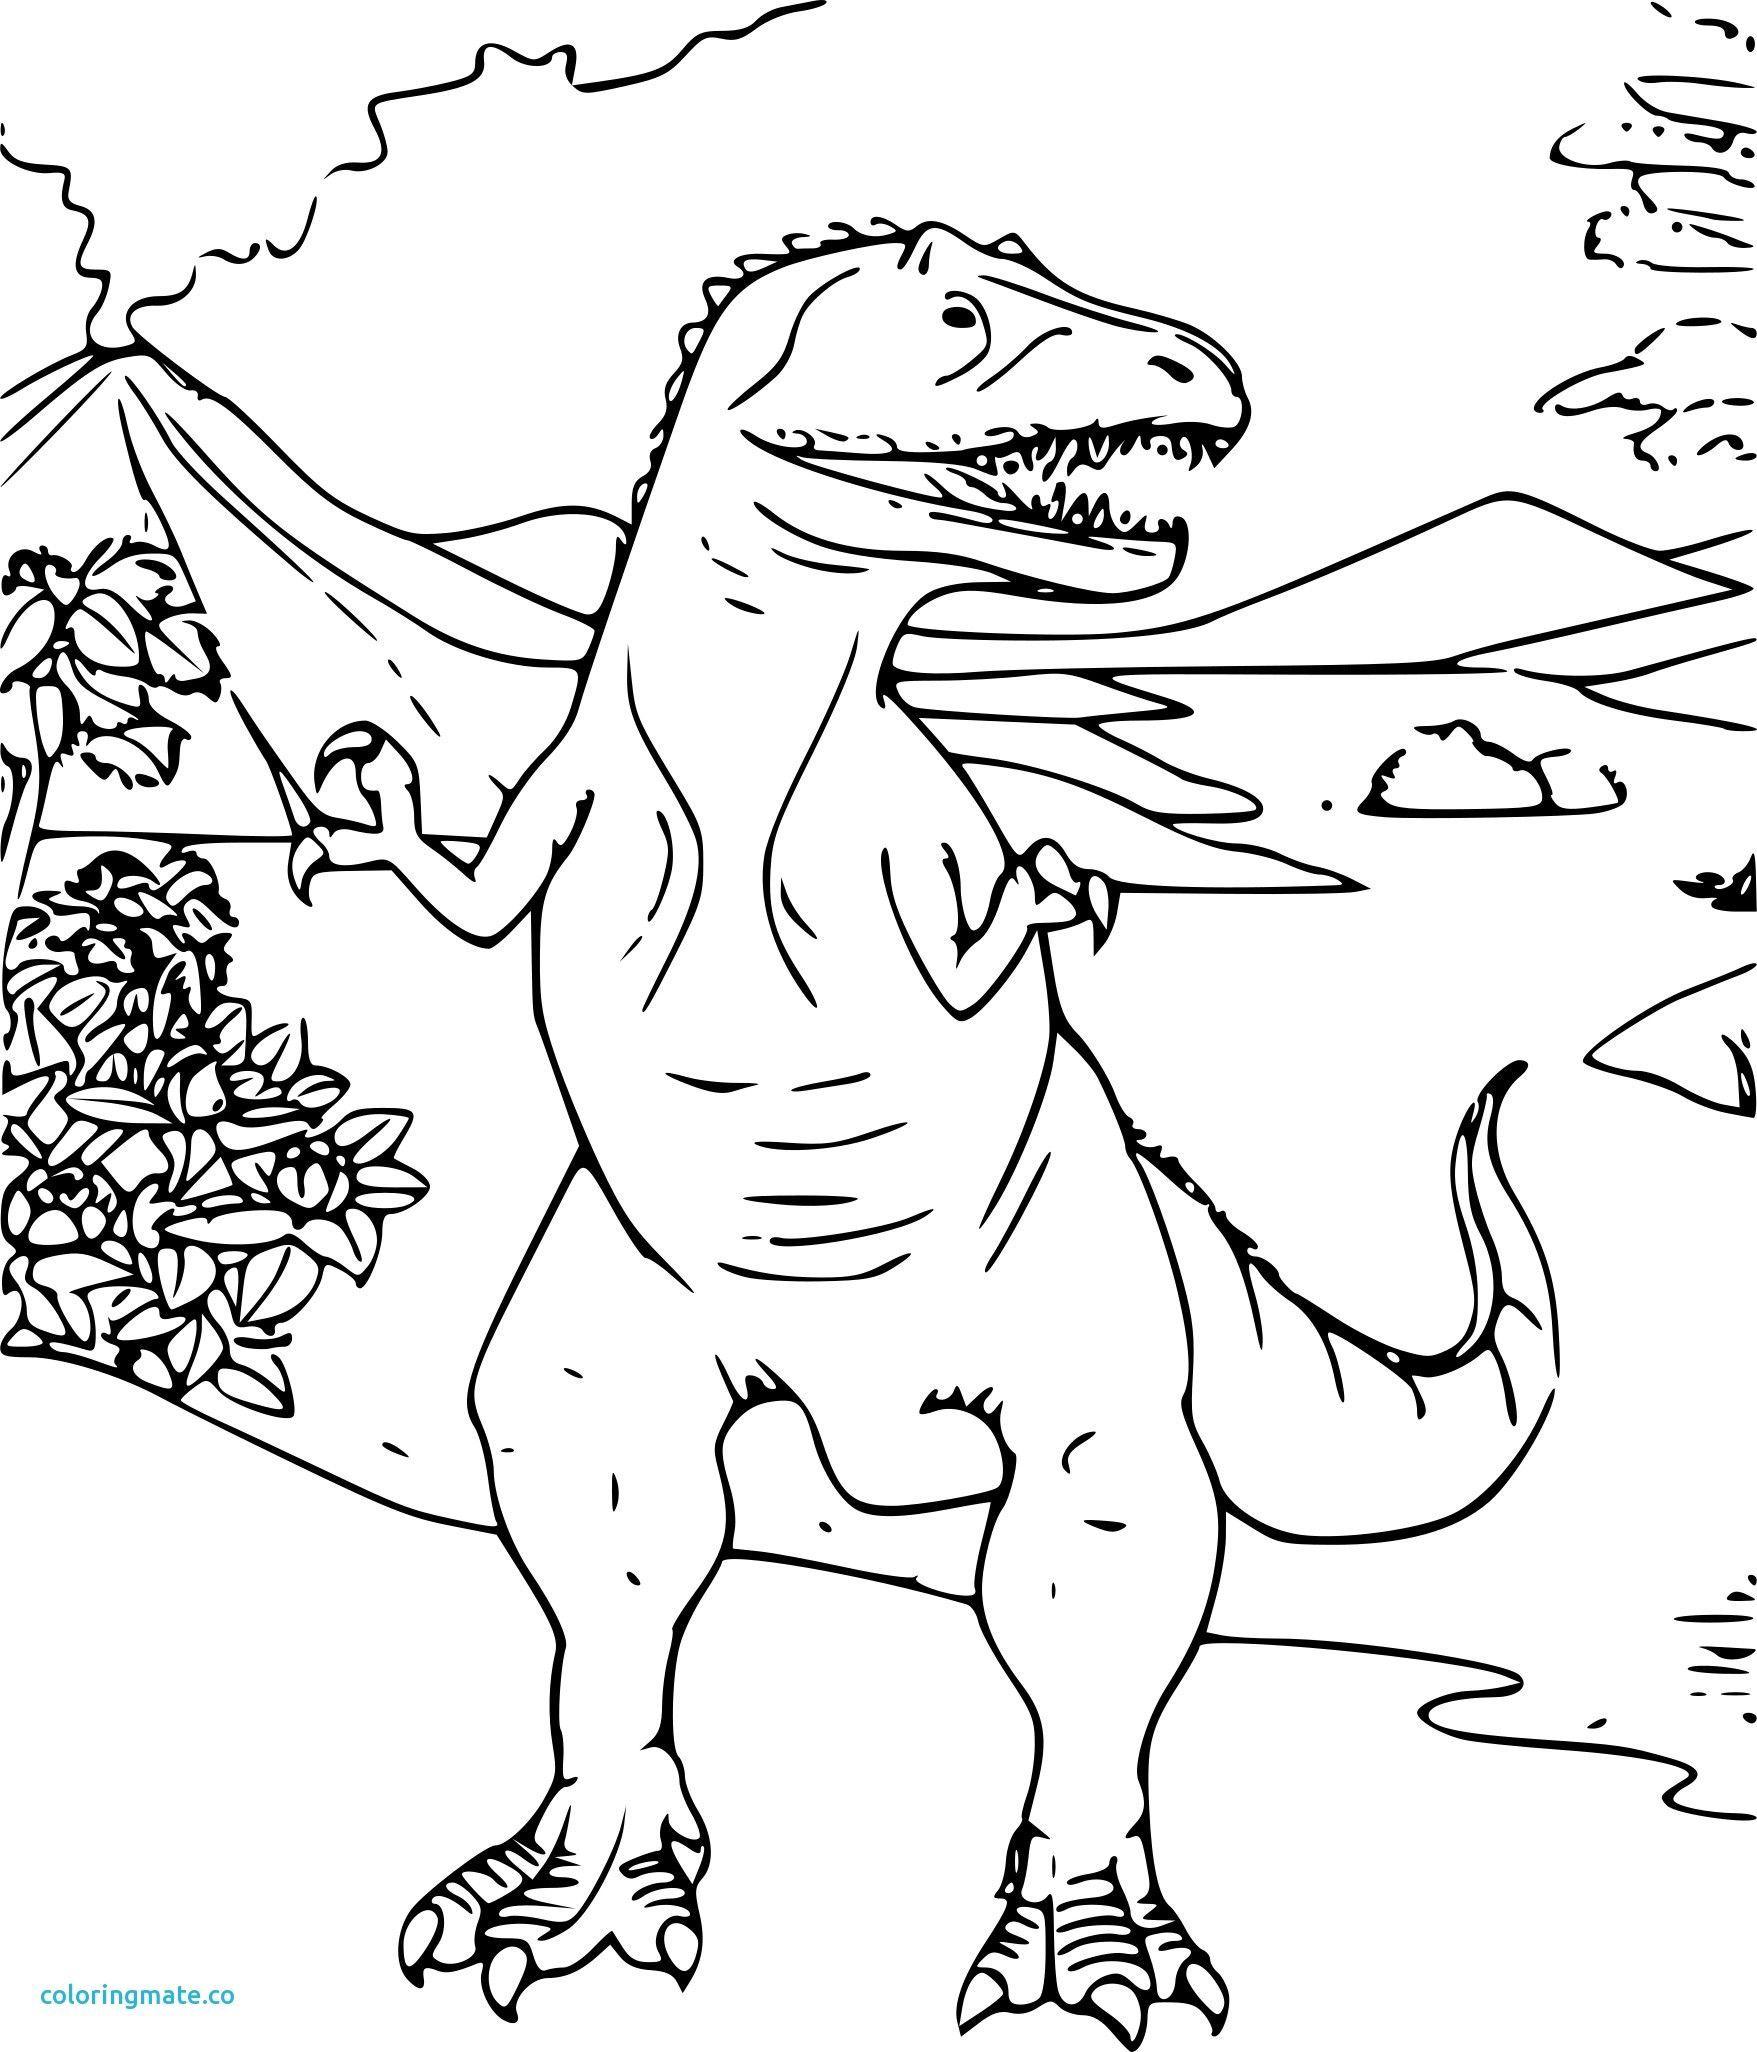 Coloriage Dinosaure Dessin Tyrannosaure T Rex A Imprimer En 2021 Coloriage Dinosaure Dinosaure A Colorier Coloriage Mandala